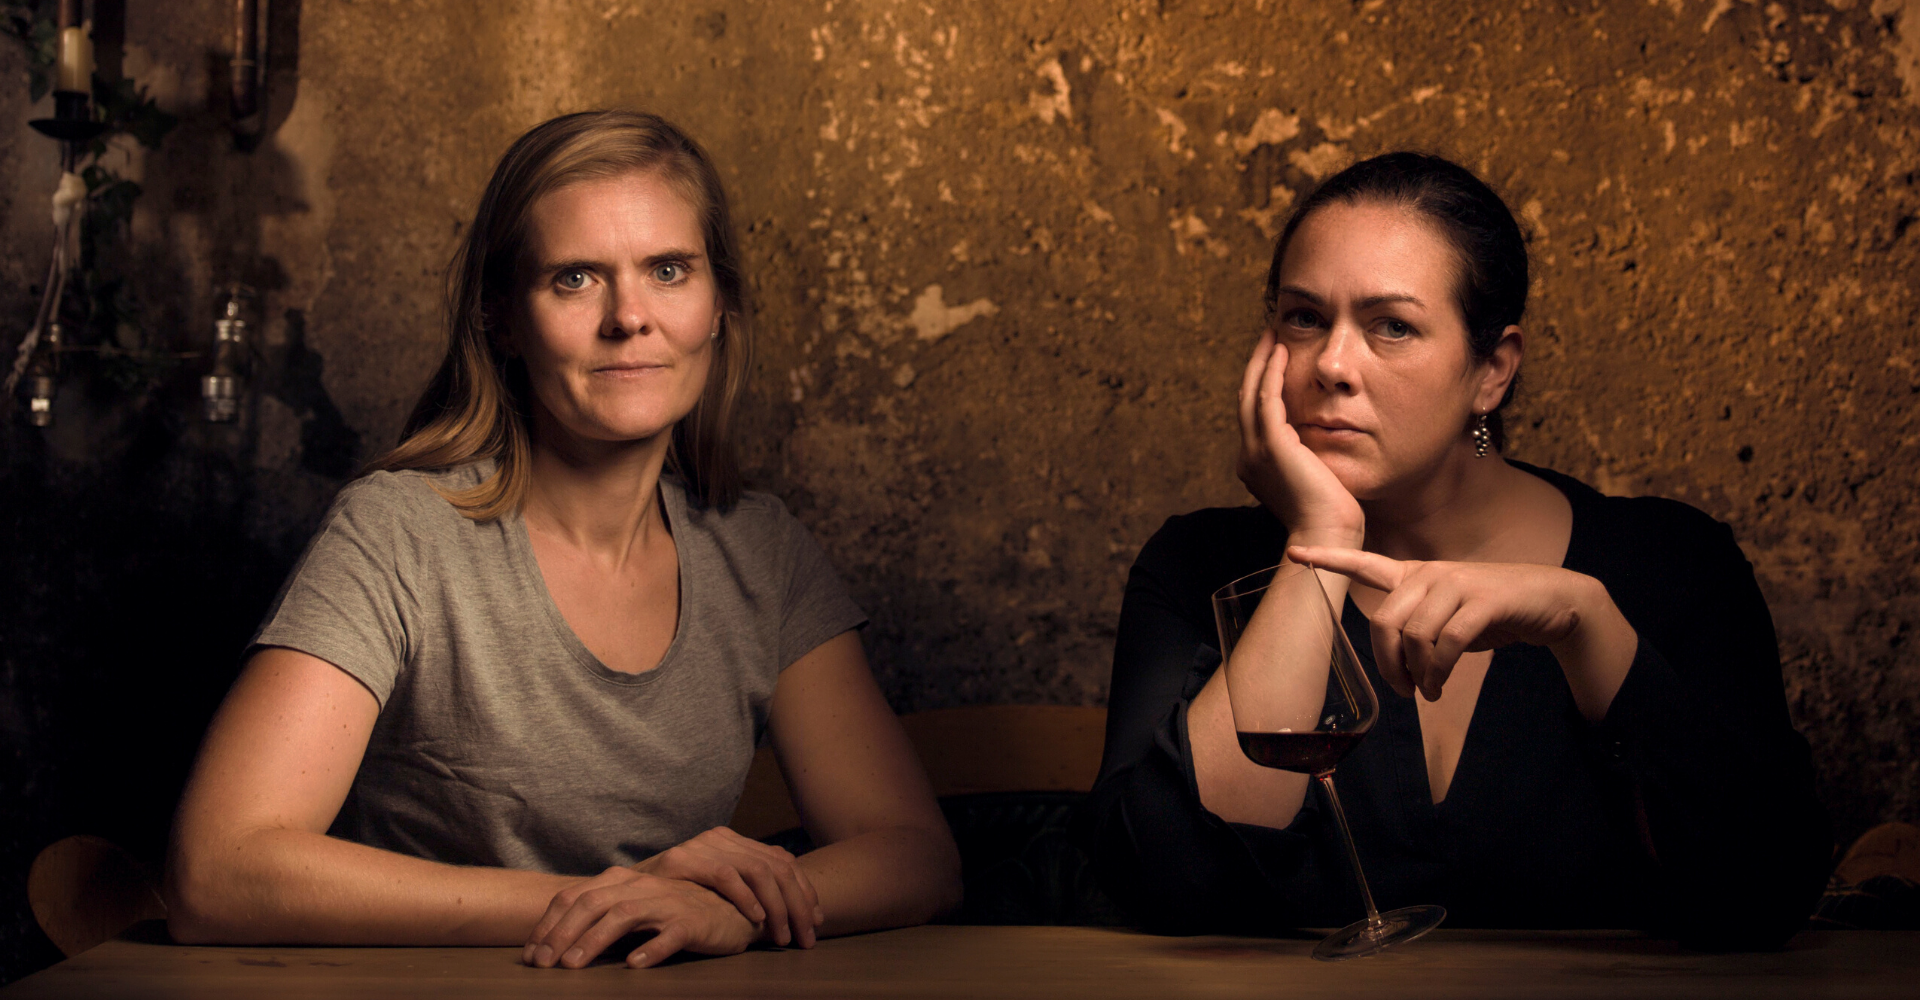 Meike and Dorte Nätel